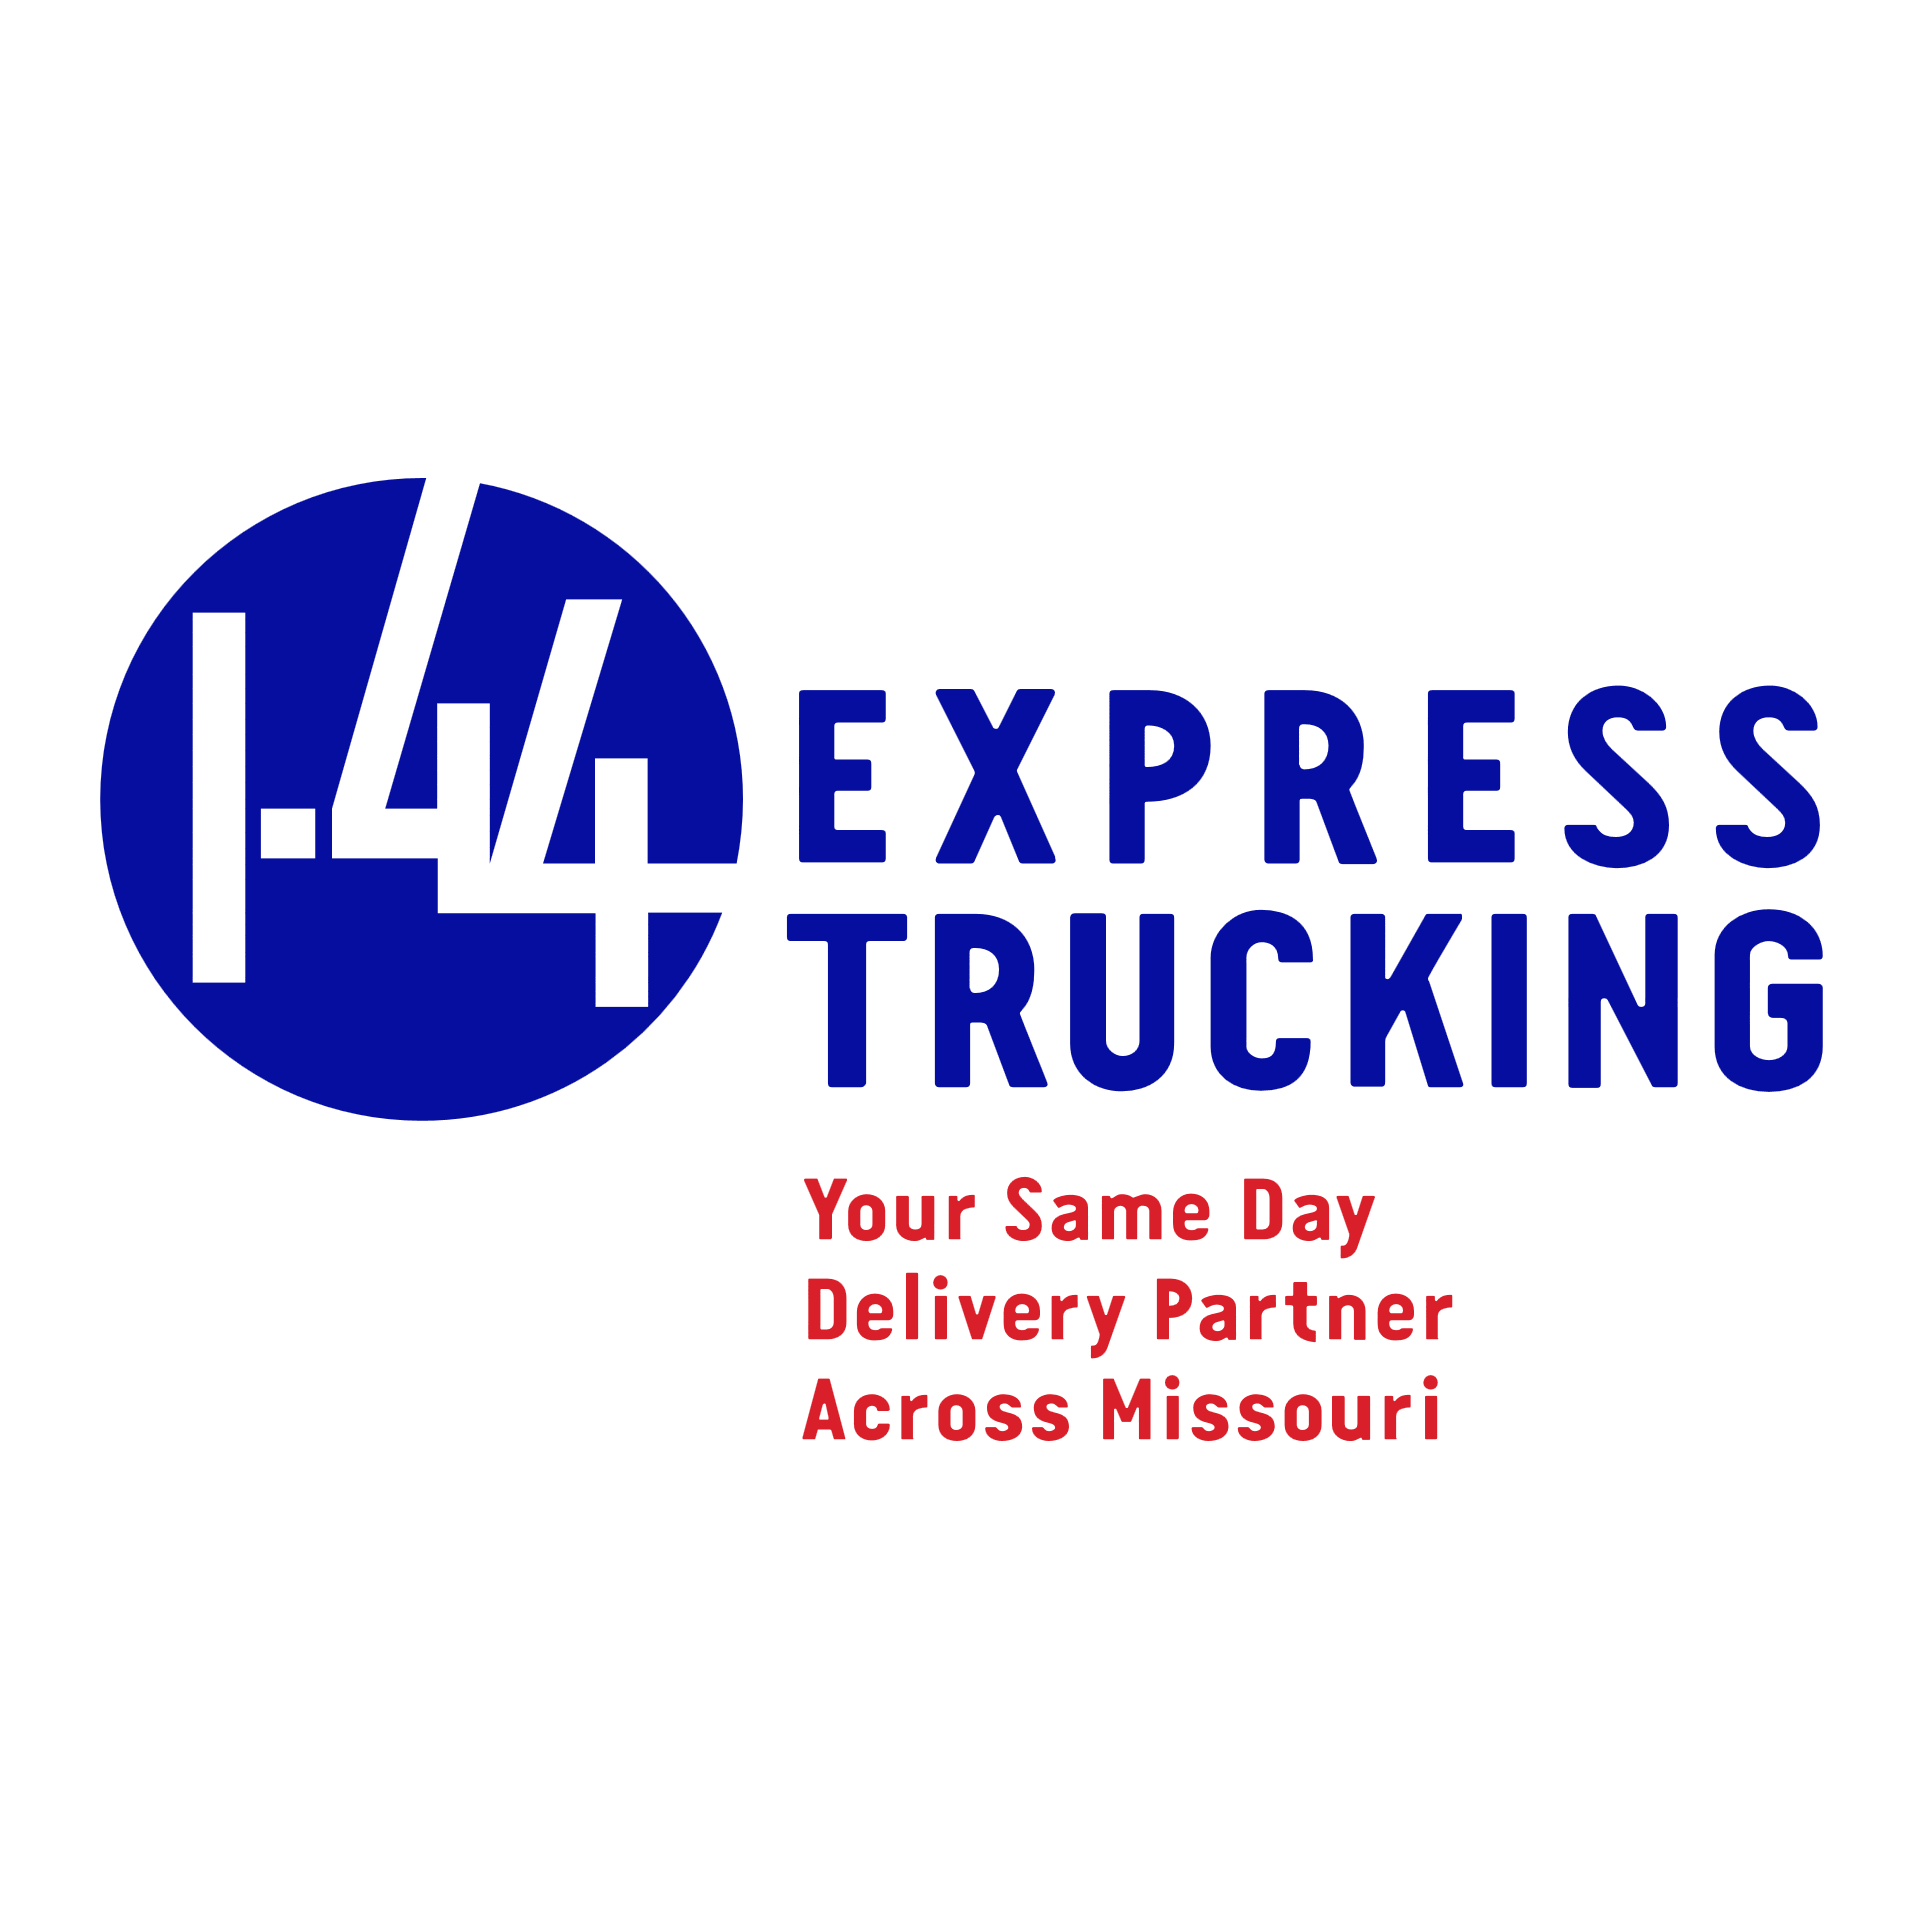 I-44 Express Trucking - Wentzville, MO - Auto Towing & Wrecking